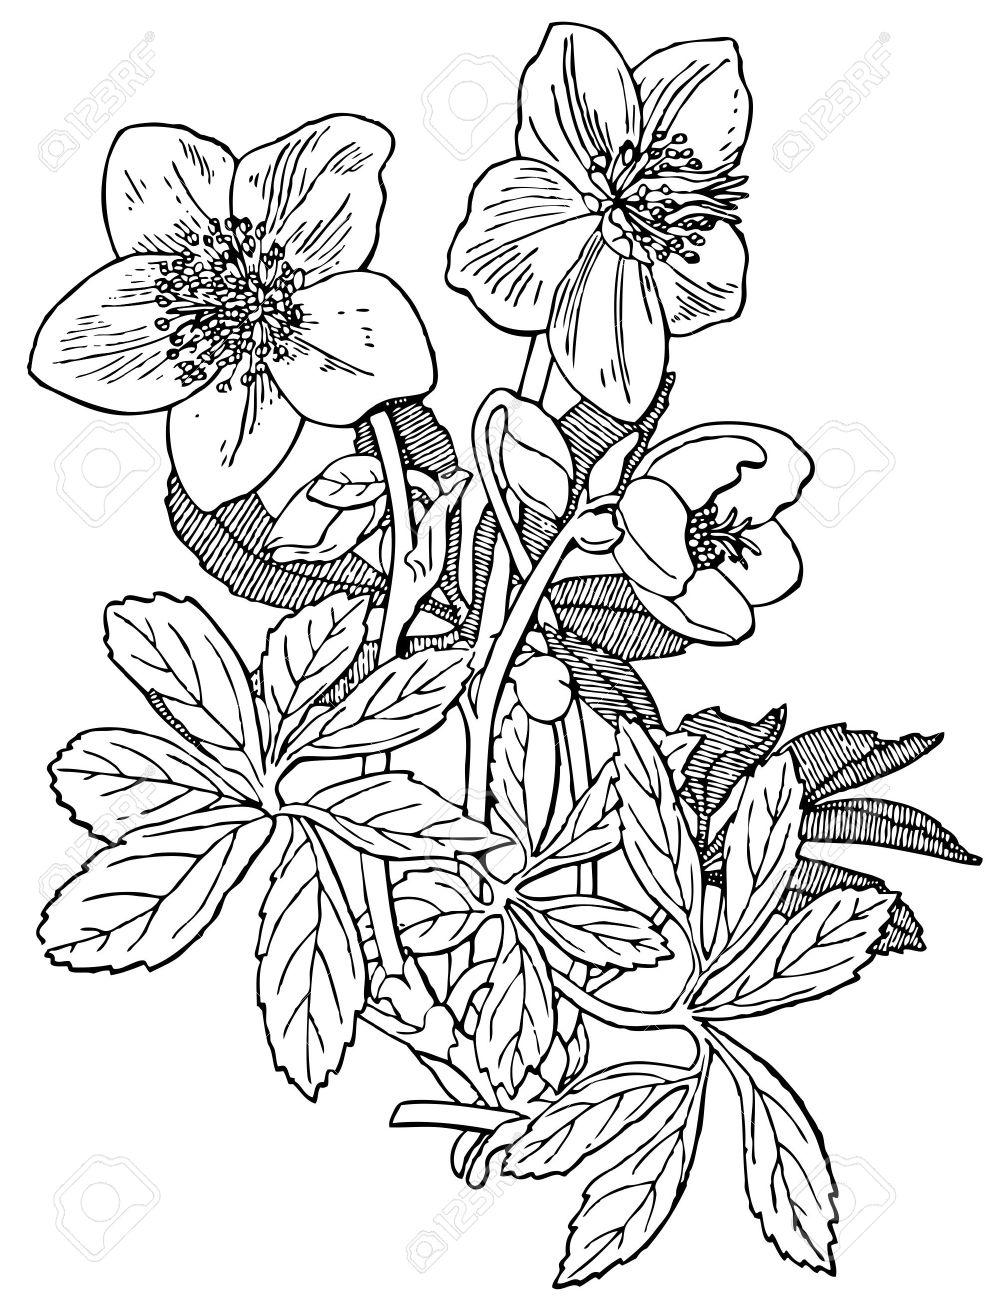 Plant Helleborus Niger Royalty Free Cliparts, Vectors, And Stock.